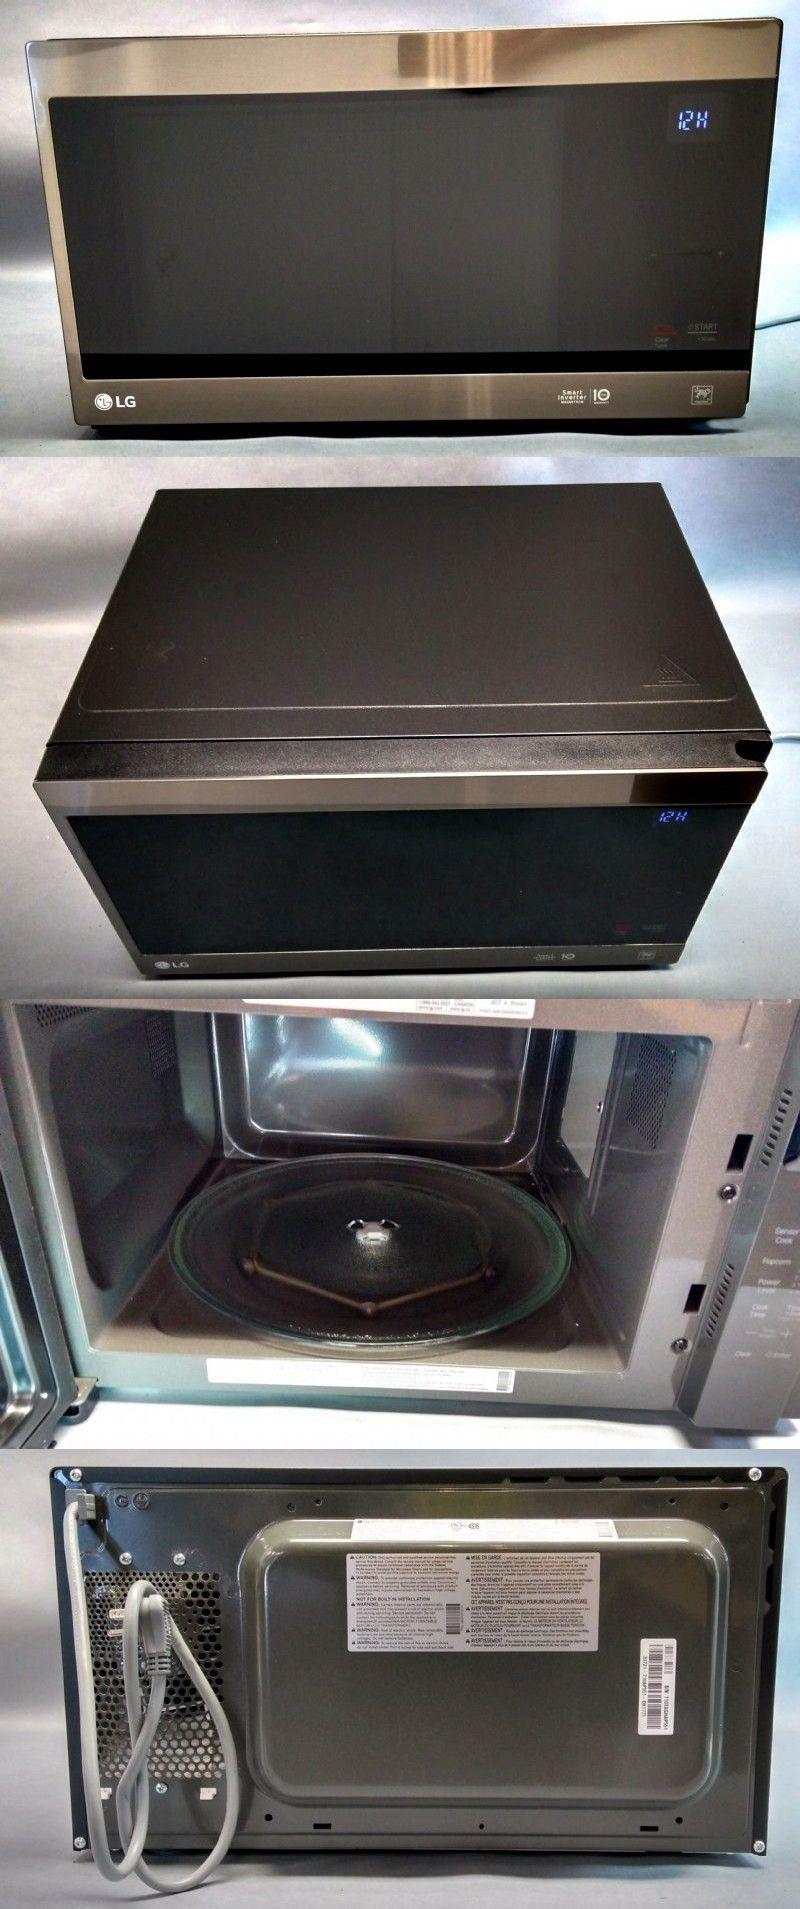 Microwave Ovens 150140 Lg Microwave Inverter 1200w Lmc1575bd 1 5